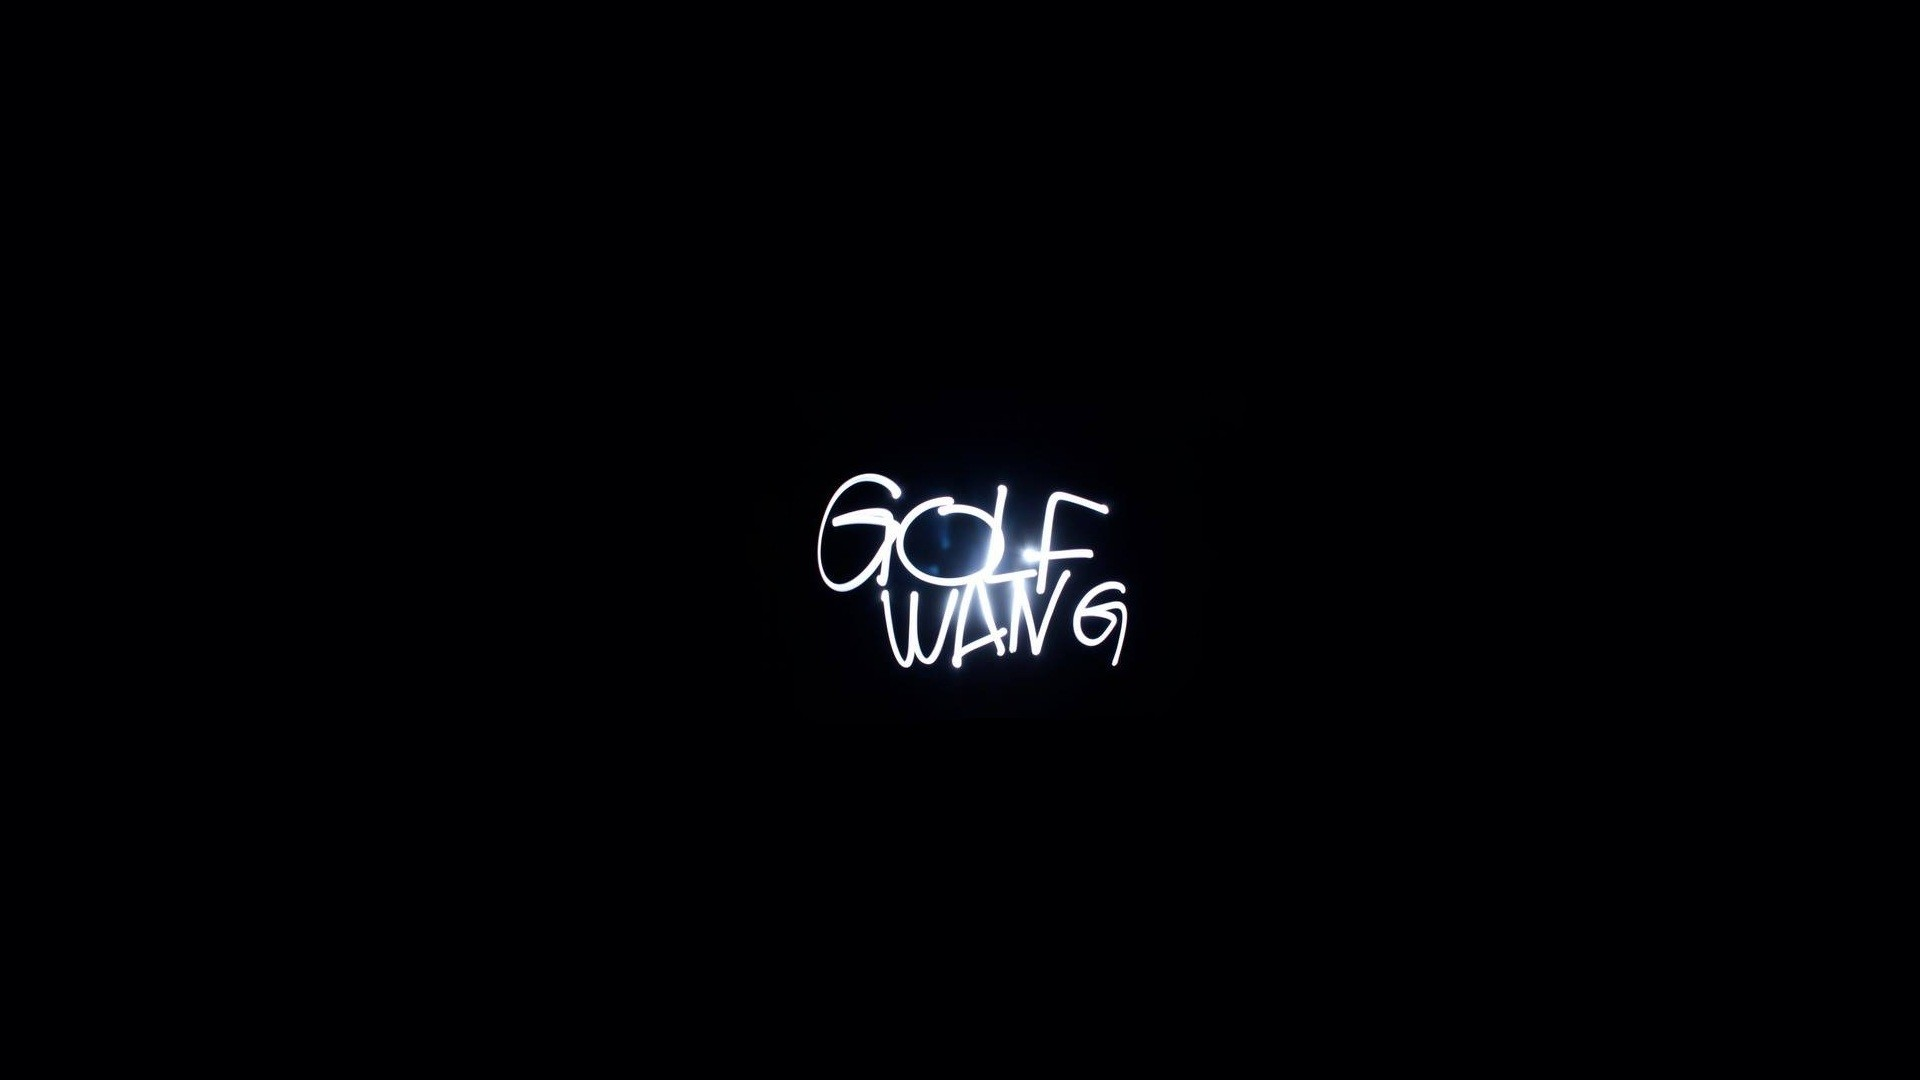 Golf Wang Cat Wallpaper.